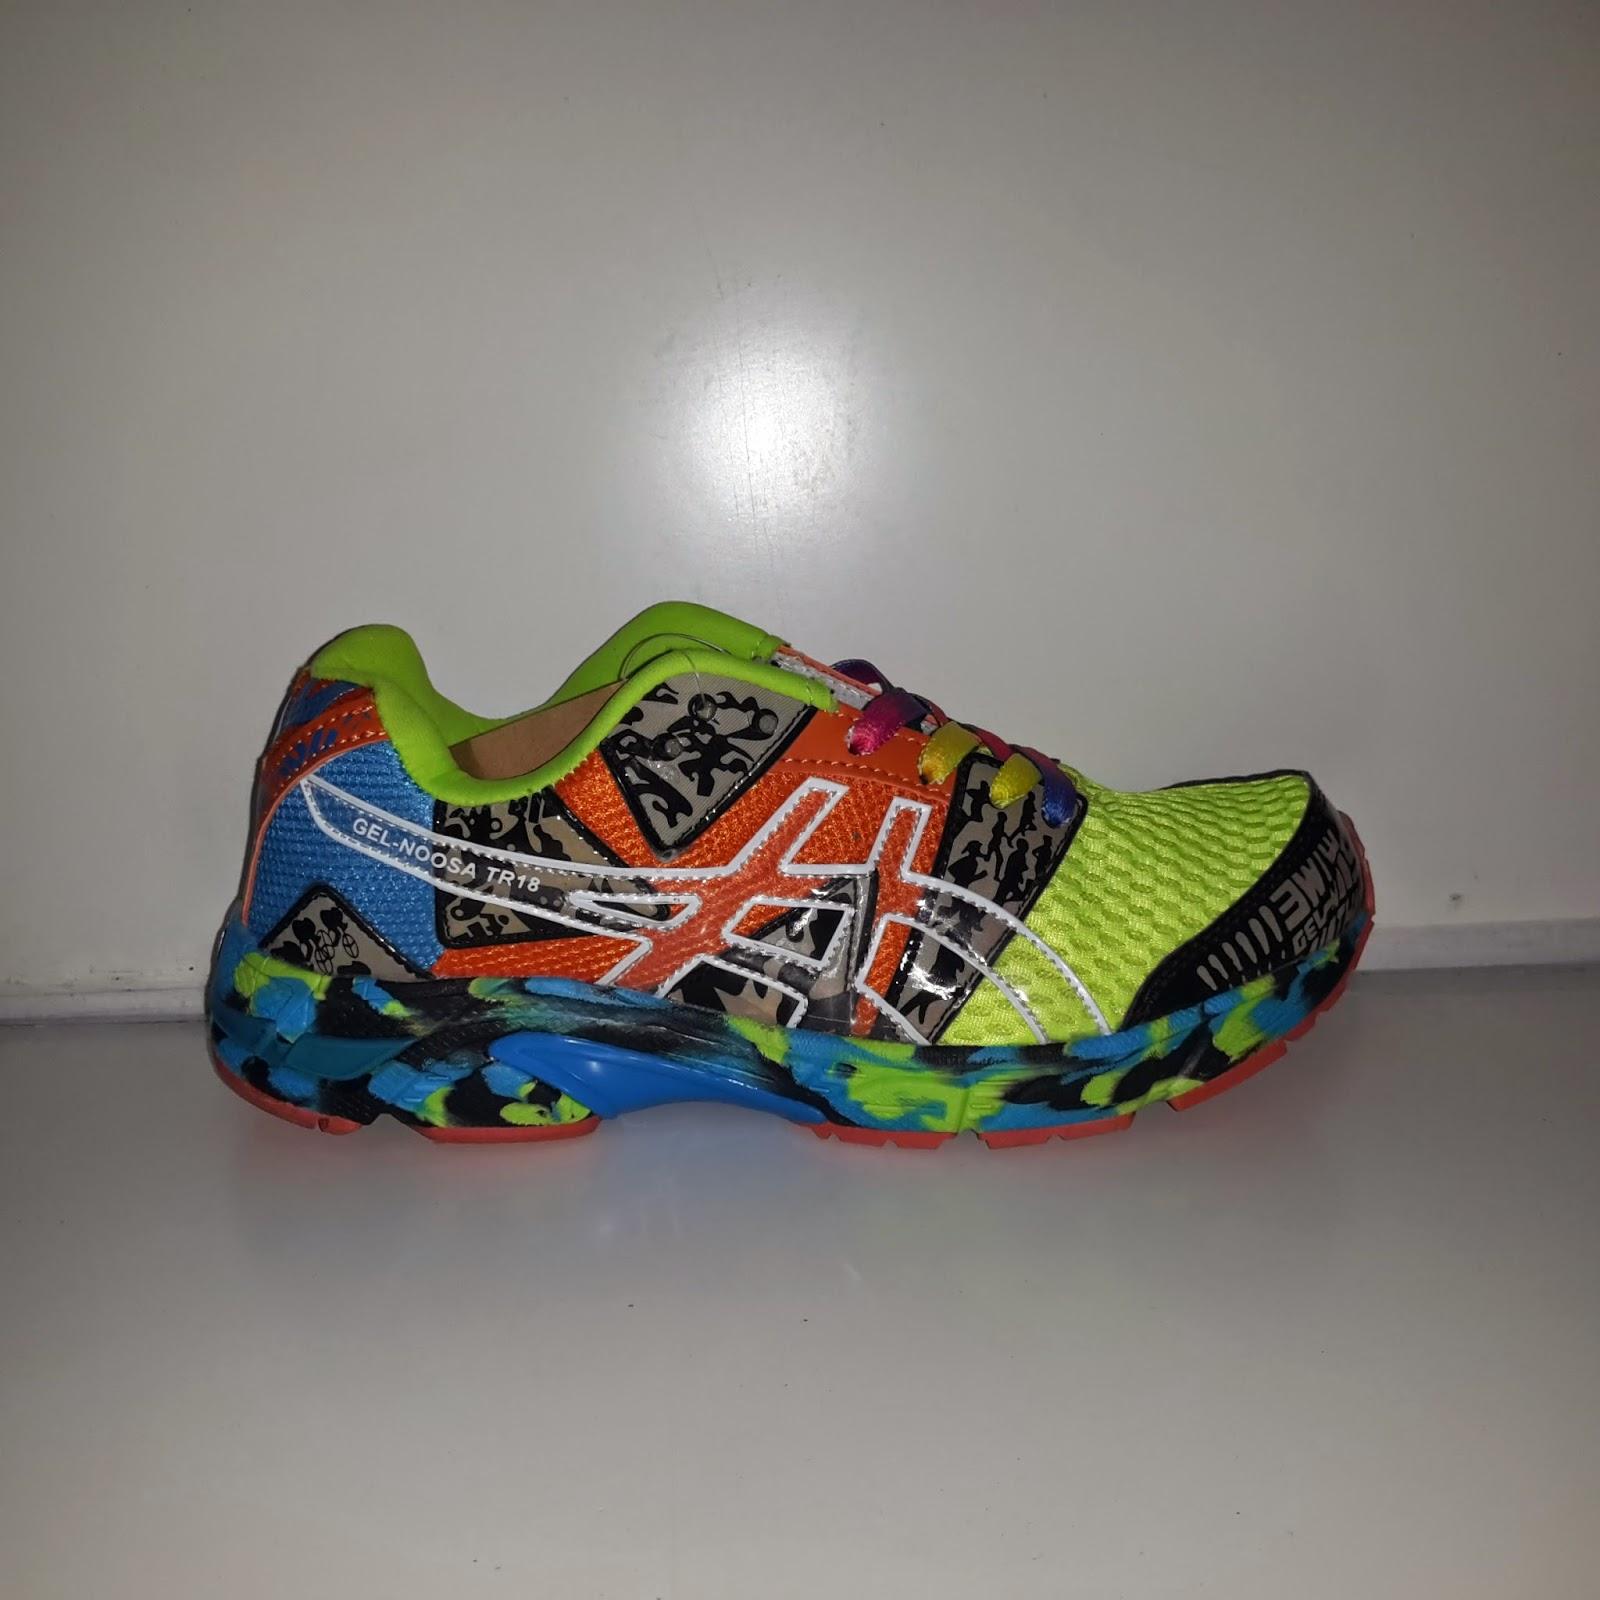 Sepatu Asics Gel Noosa TR 18 2015 Murah